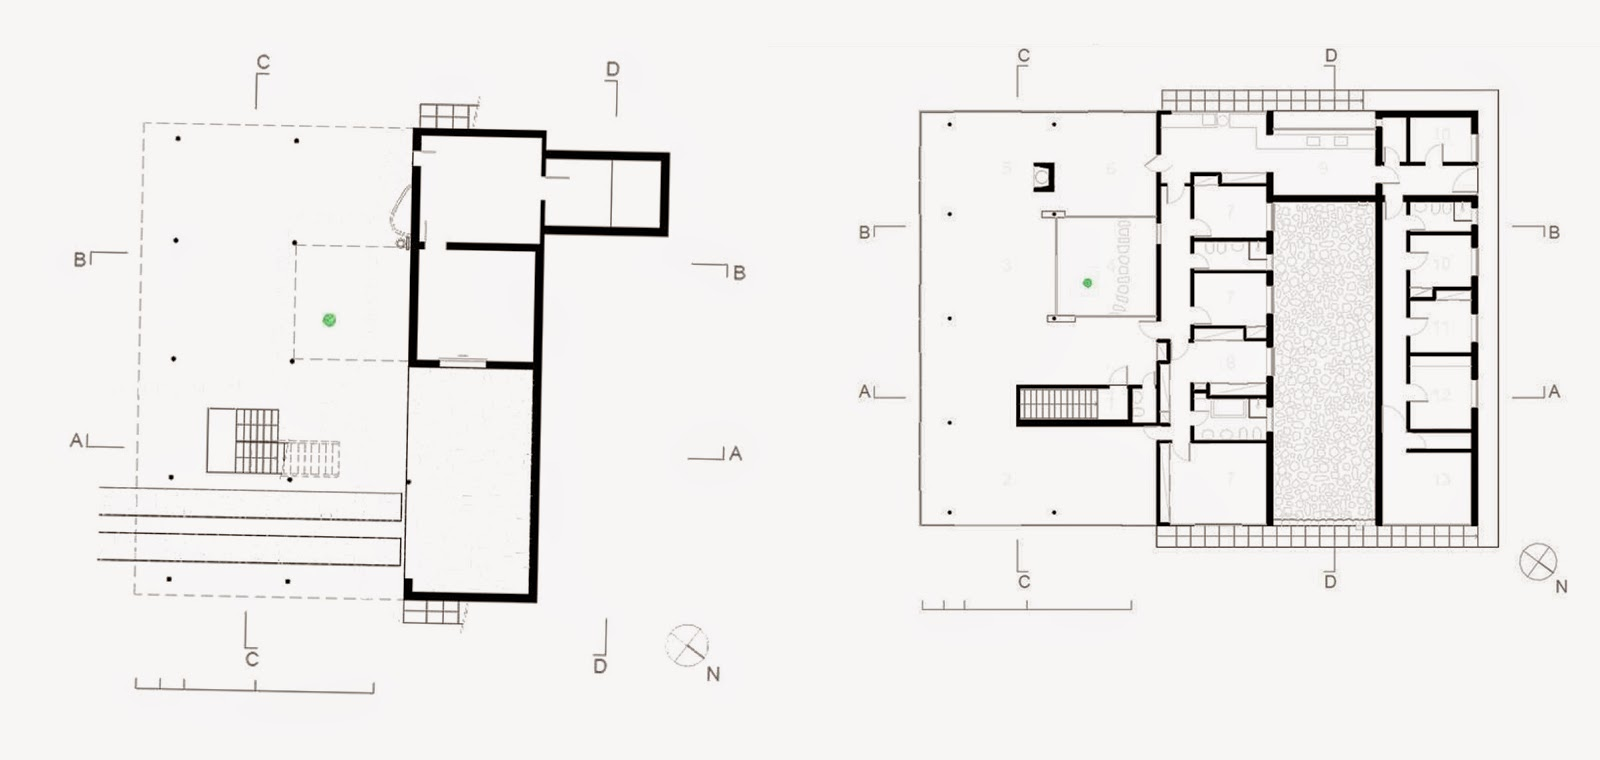 housing and architecture 4 casa de vidro glass house lina bo